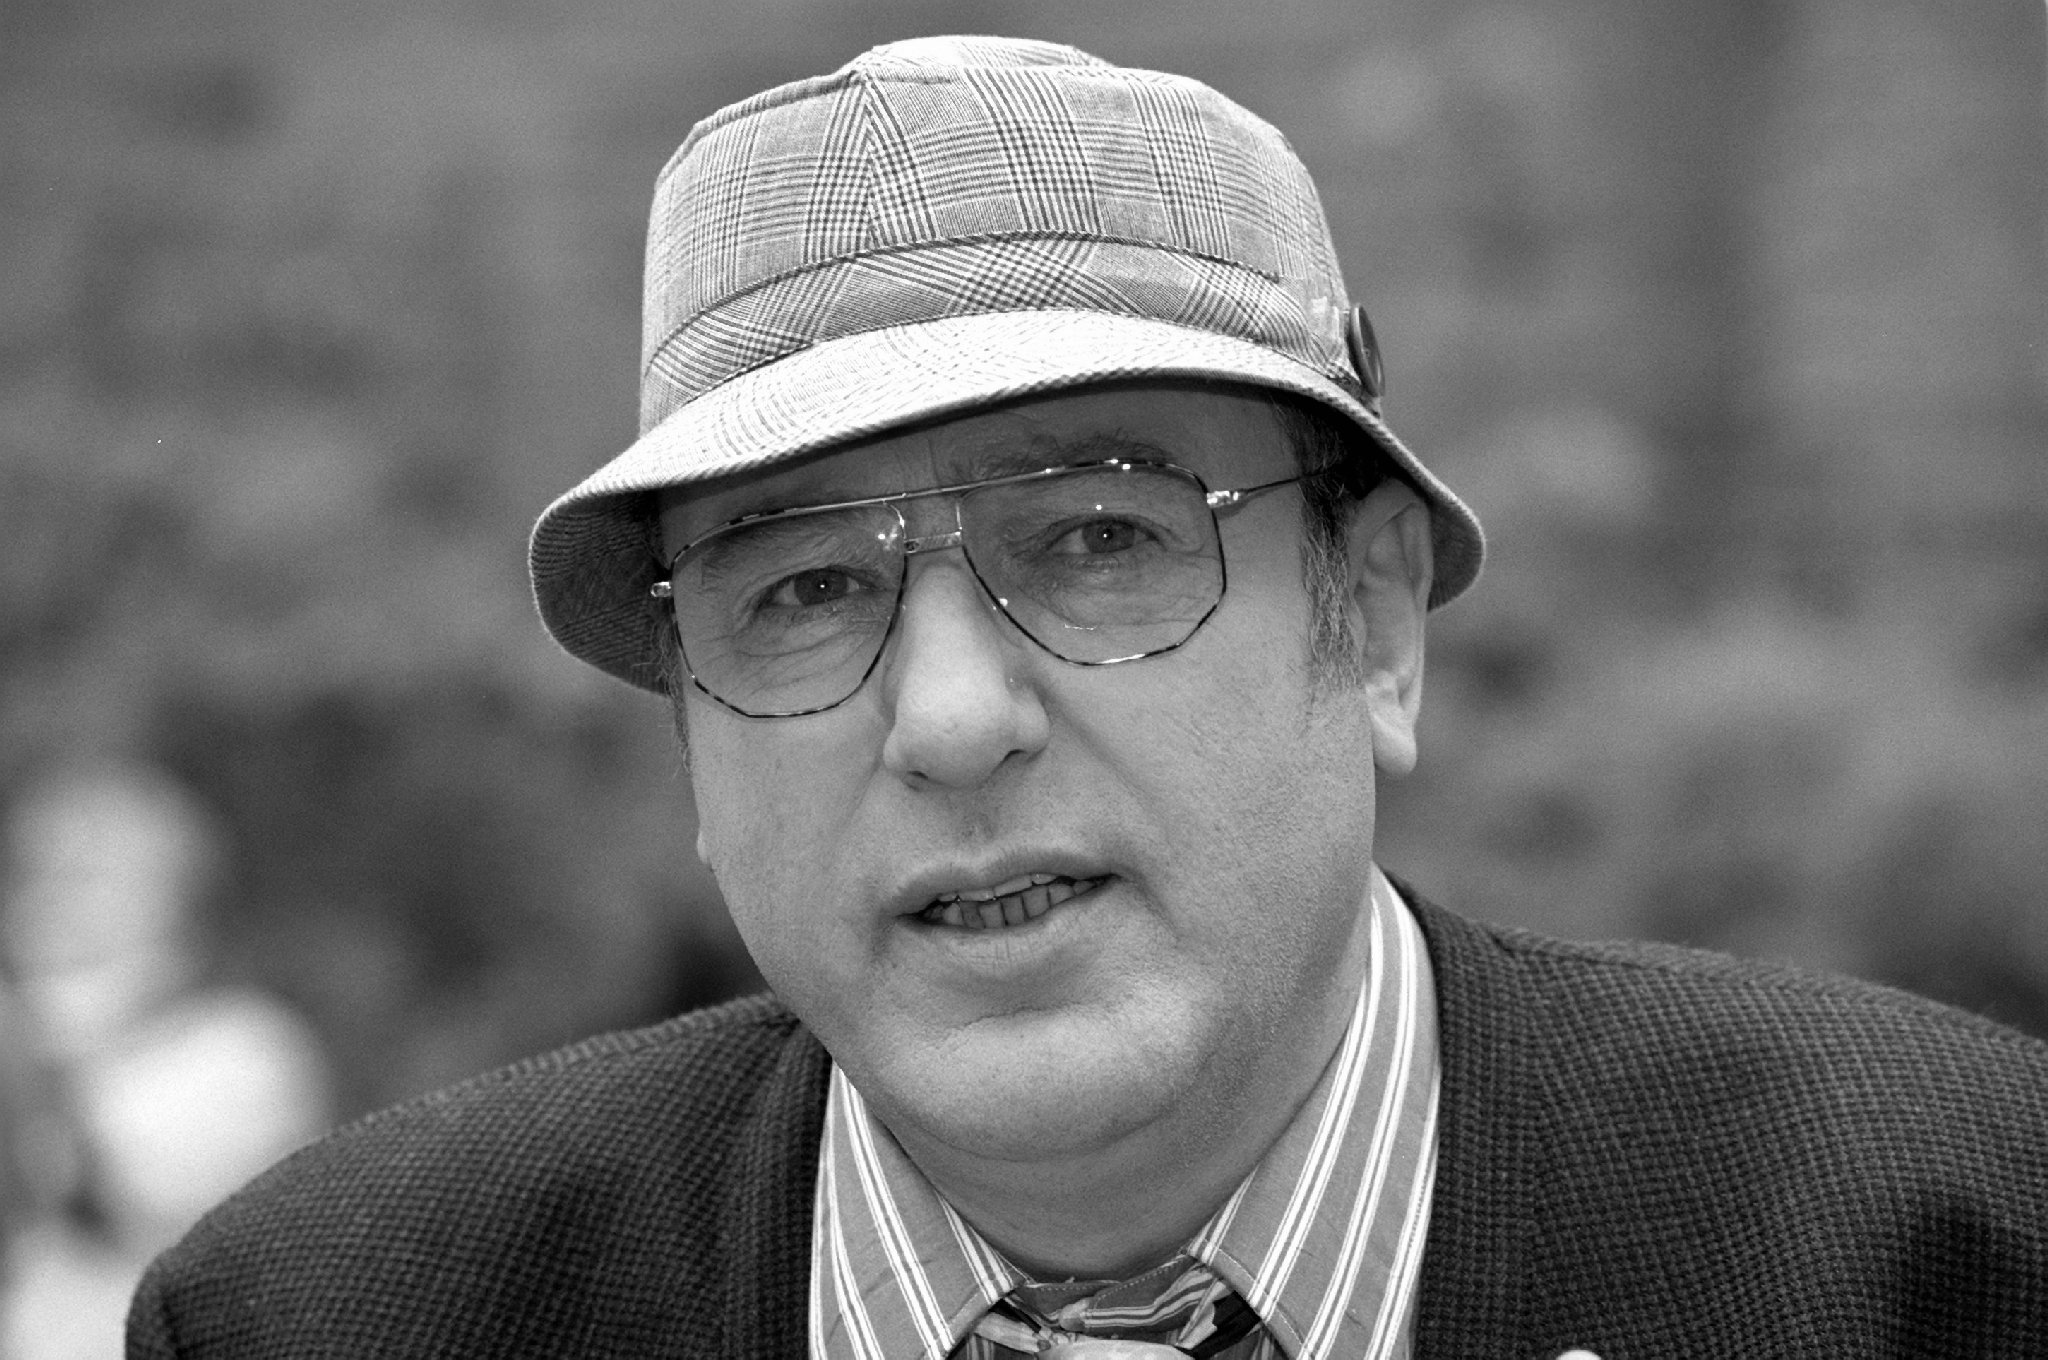 Manfred Krug (* 8. Februar 1937 in Duisburg; † 21. Oktober 2016 in Berlin)